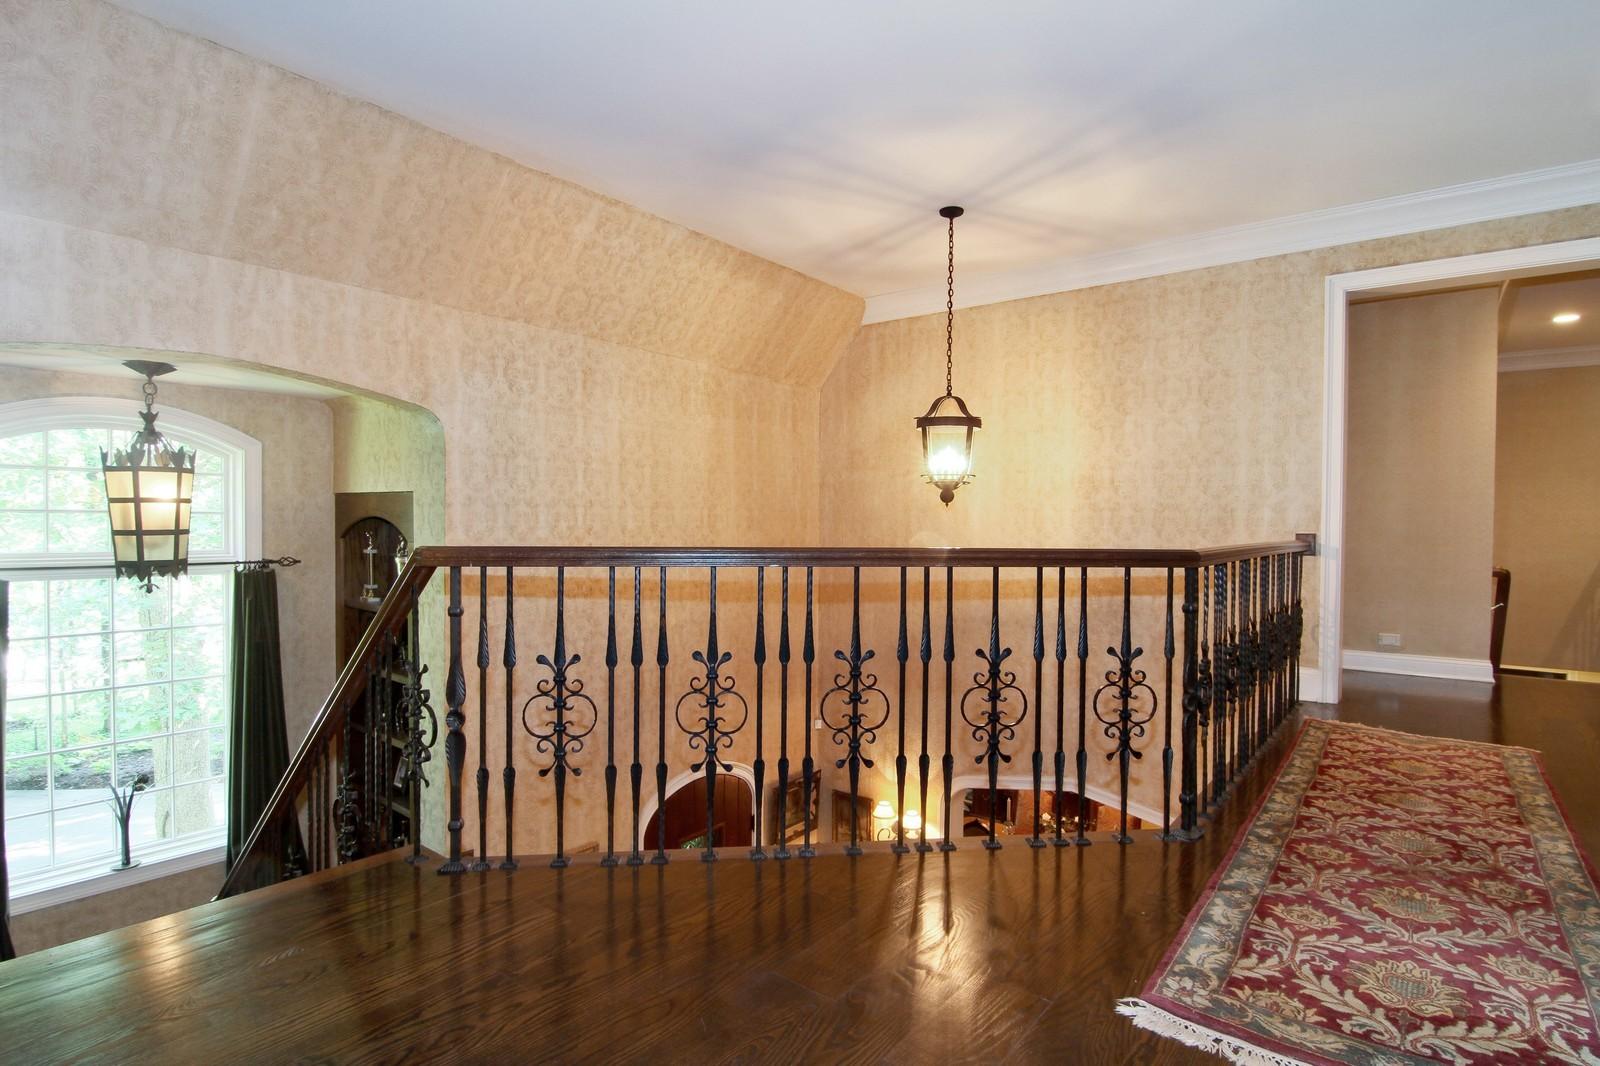 Real Estate Photography - 2901 Glenbriar Dr, St Charles, IL, 60174 - 2nd Floor Corridor